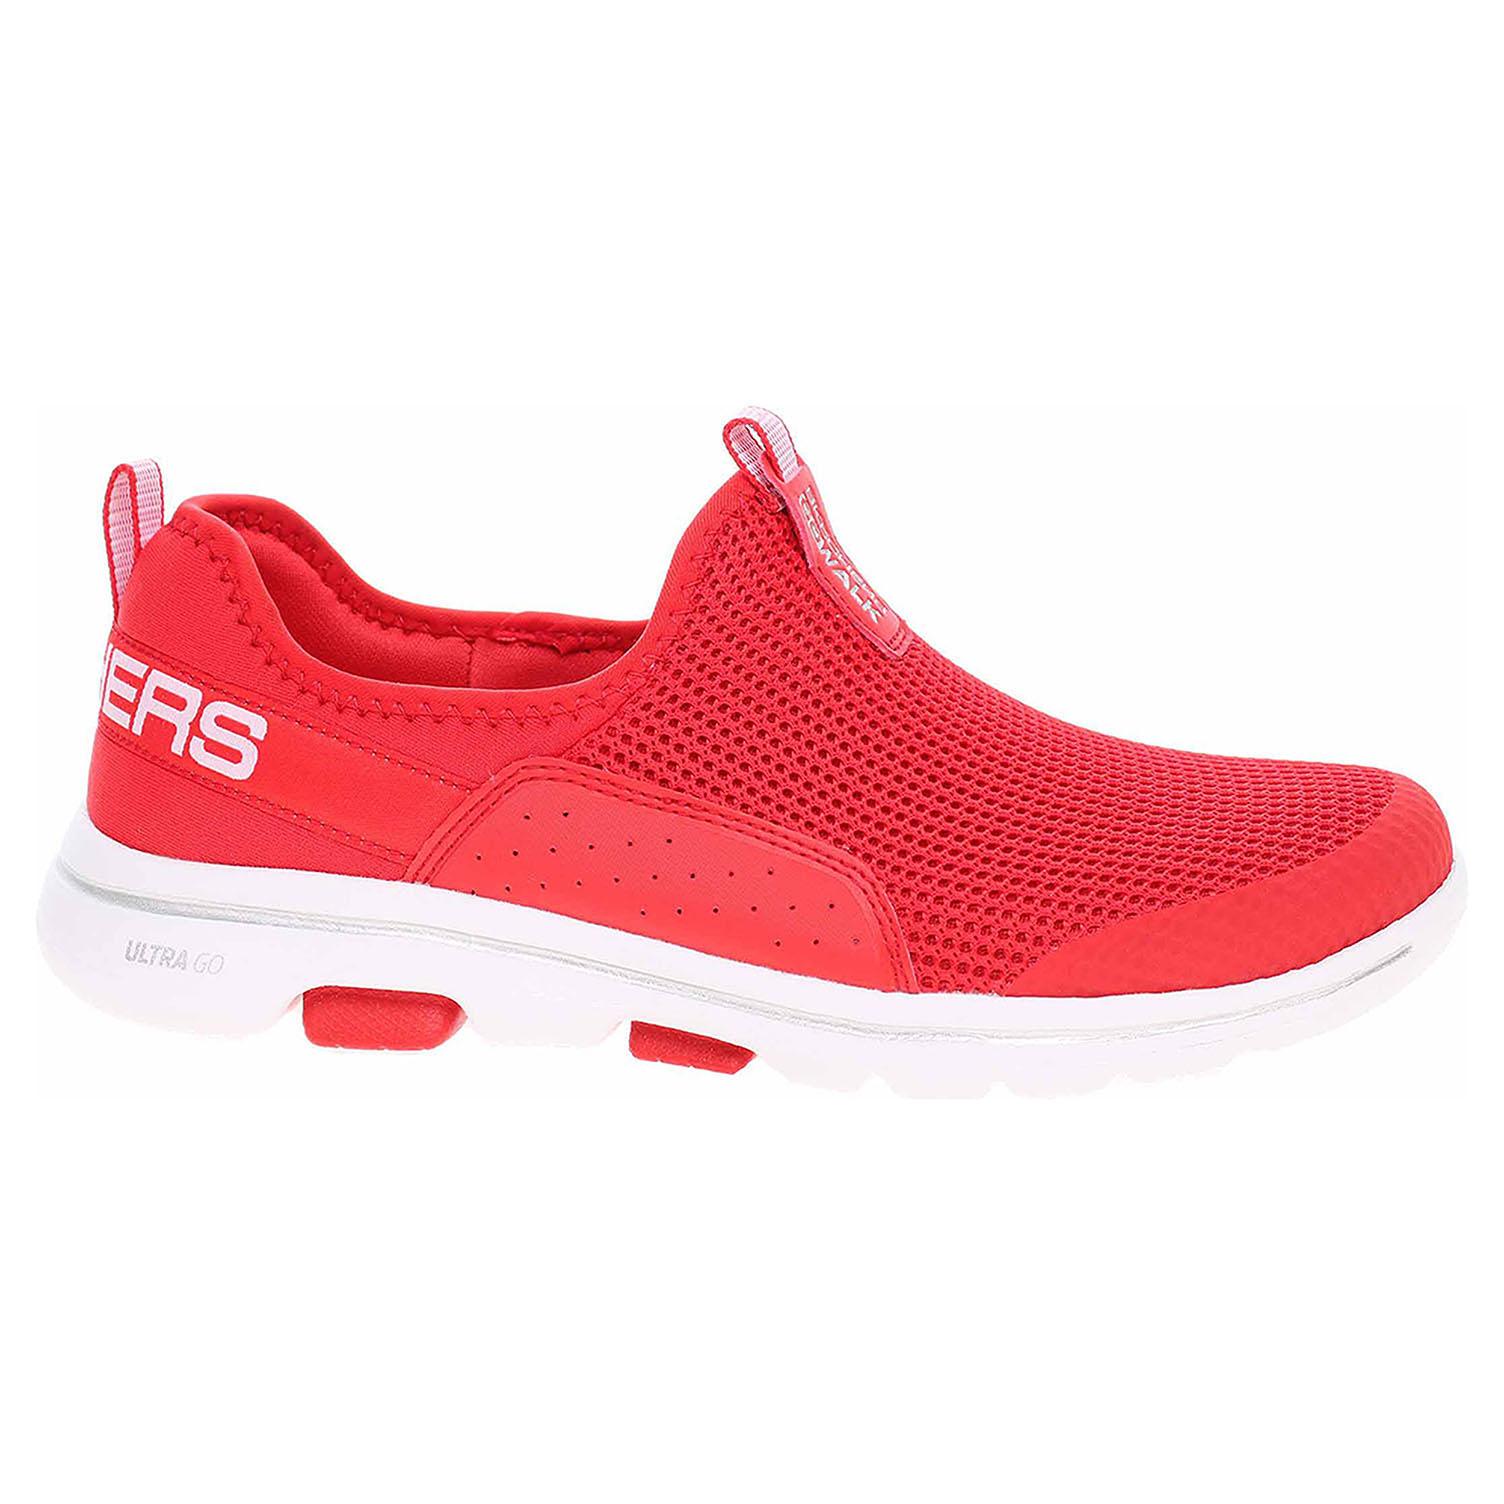 Skechers Go Walk 5 - Sovereign red 124013 RED 39